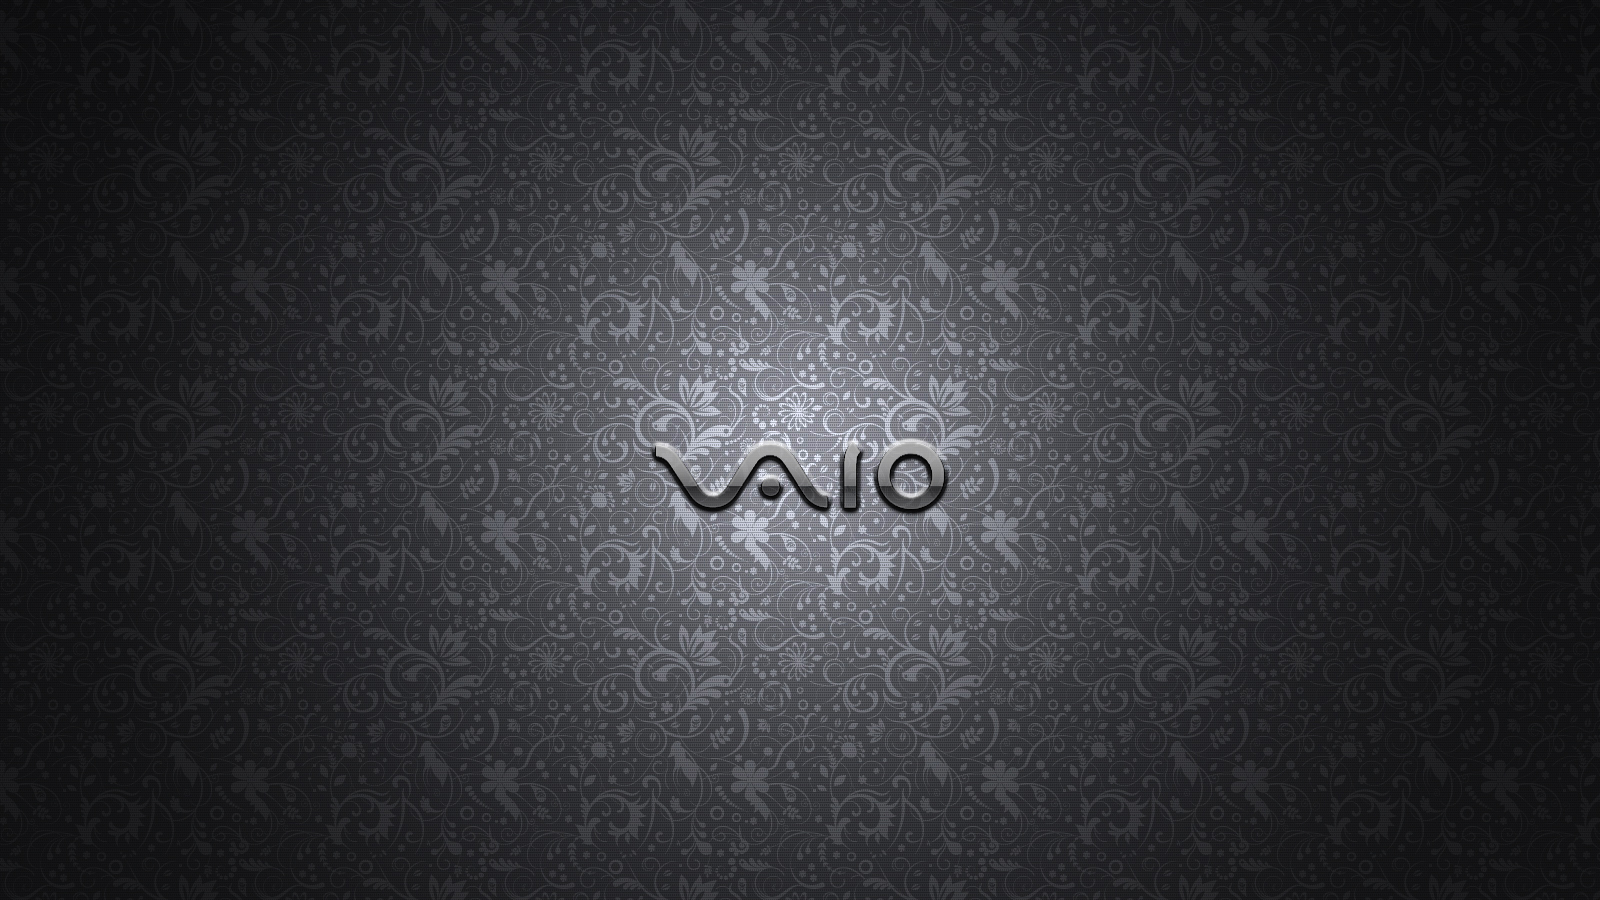 vaio wallpapers hd vaio wallpapers hd vaio wallpapers hd vaio 1600x900